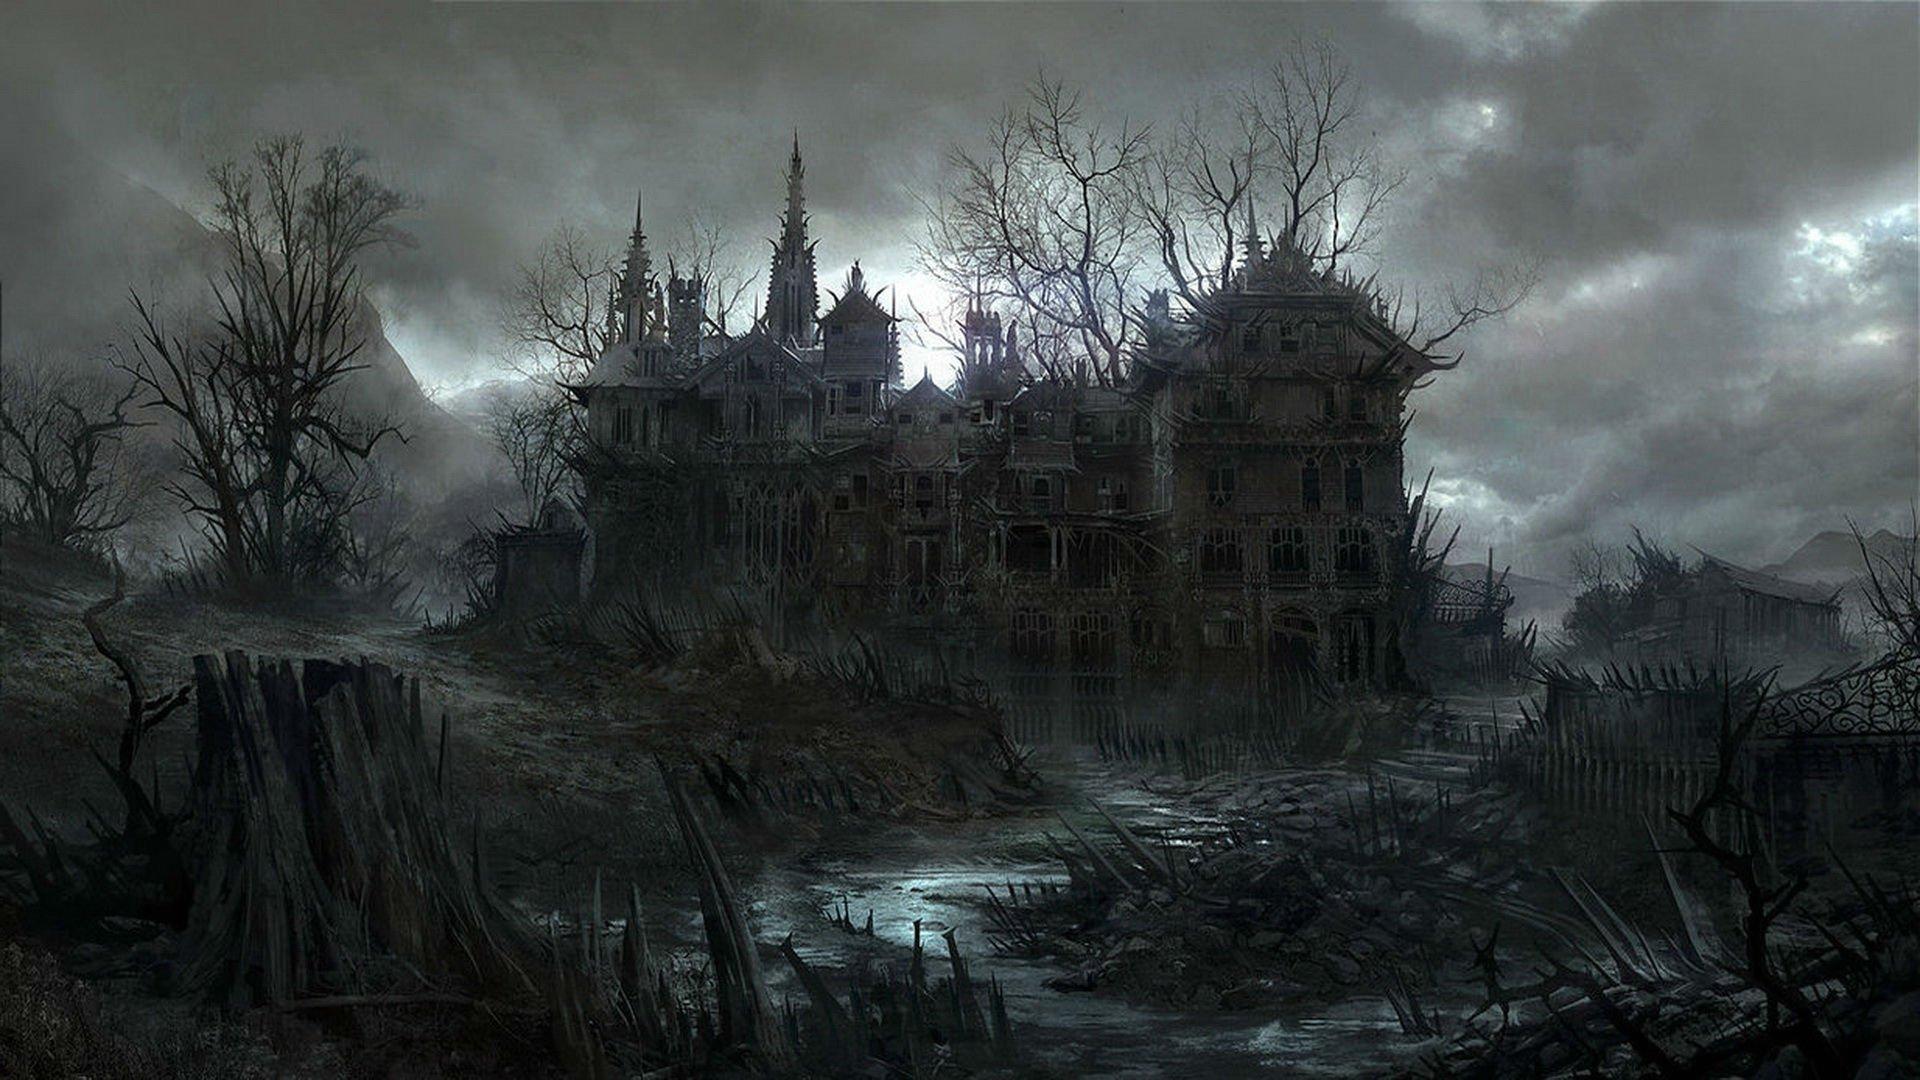 HALLOWEEN dark haunted house spooky wallpaper background 1920x1080